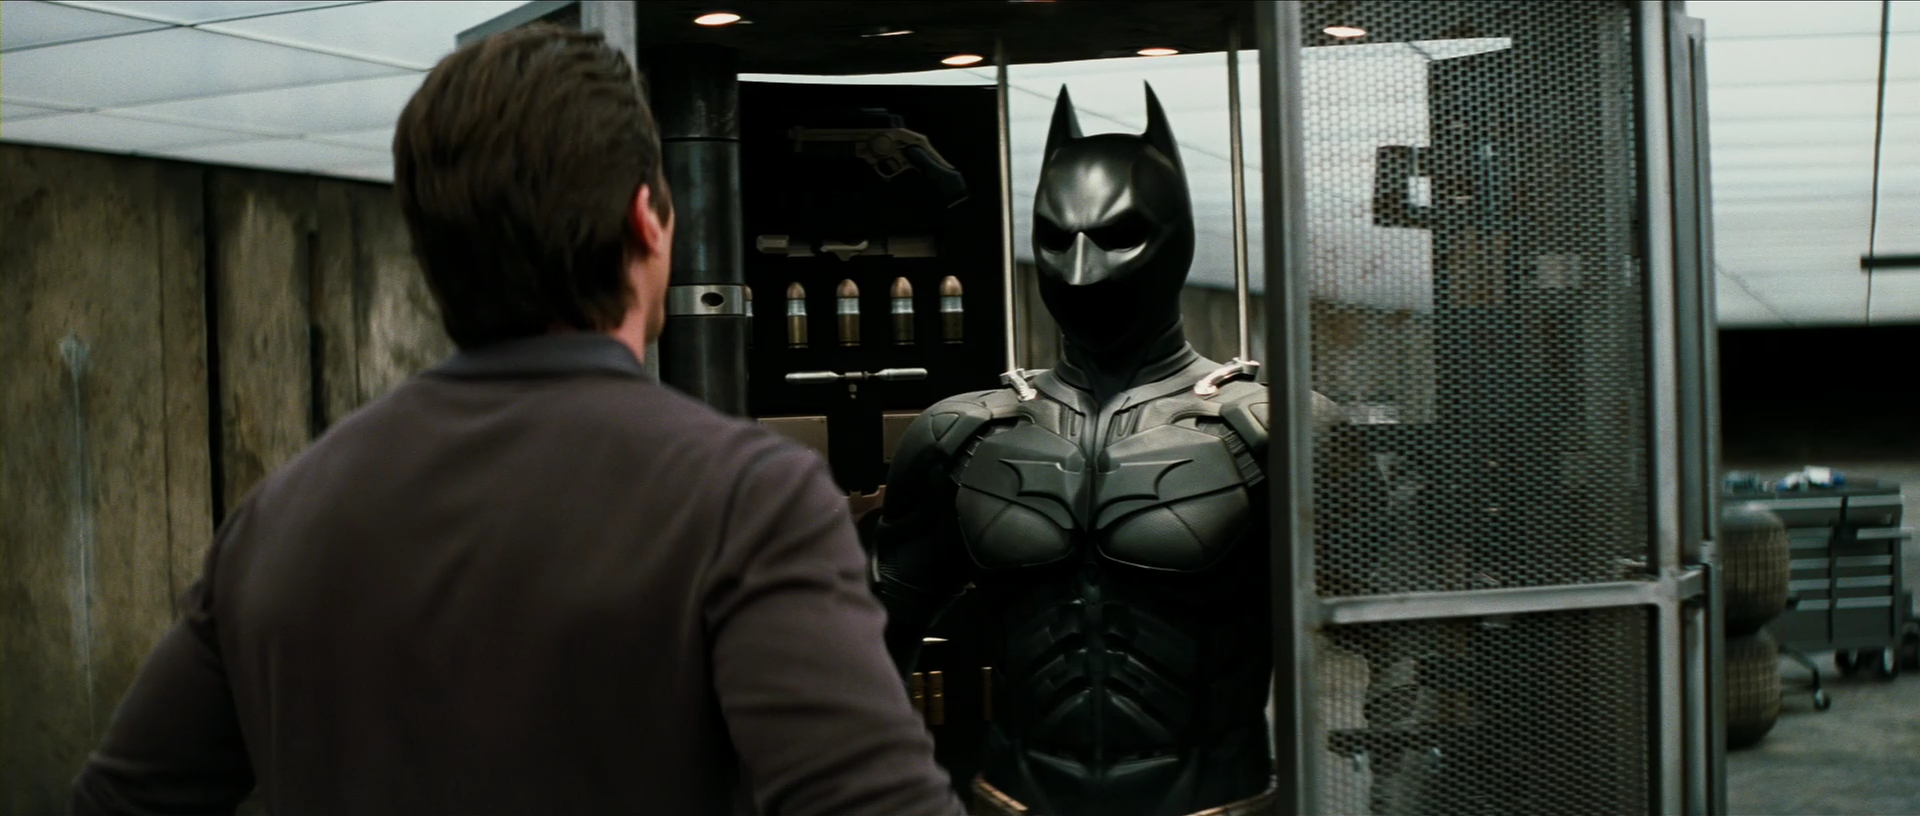 The Dark Knight - Trailer 3.jpg